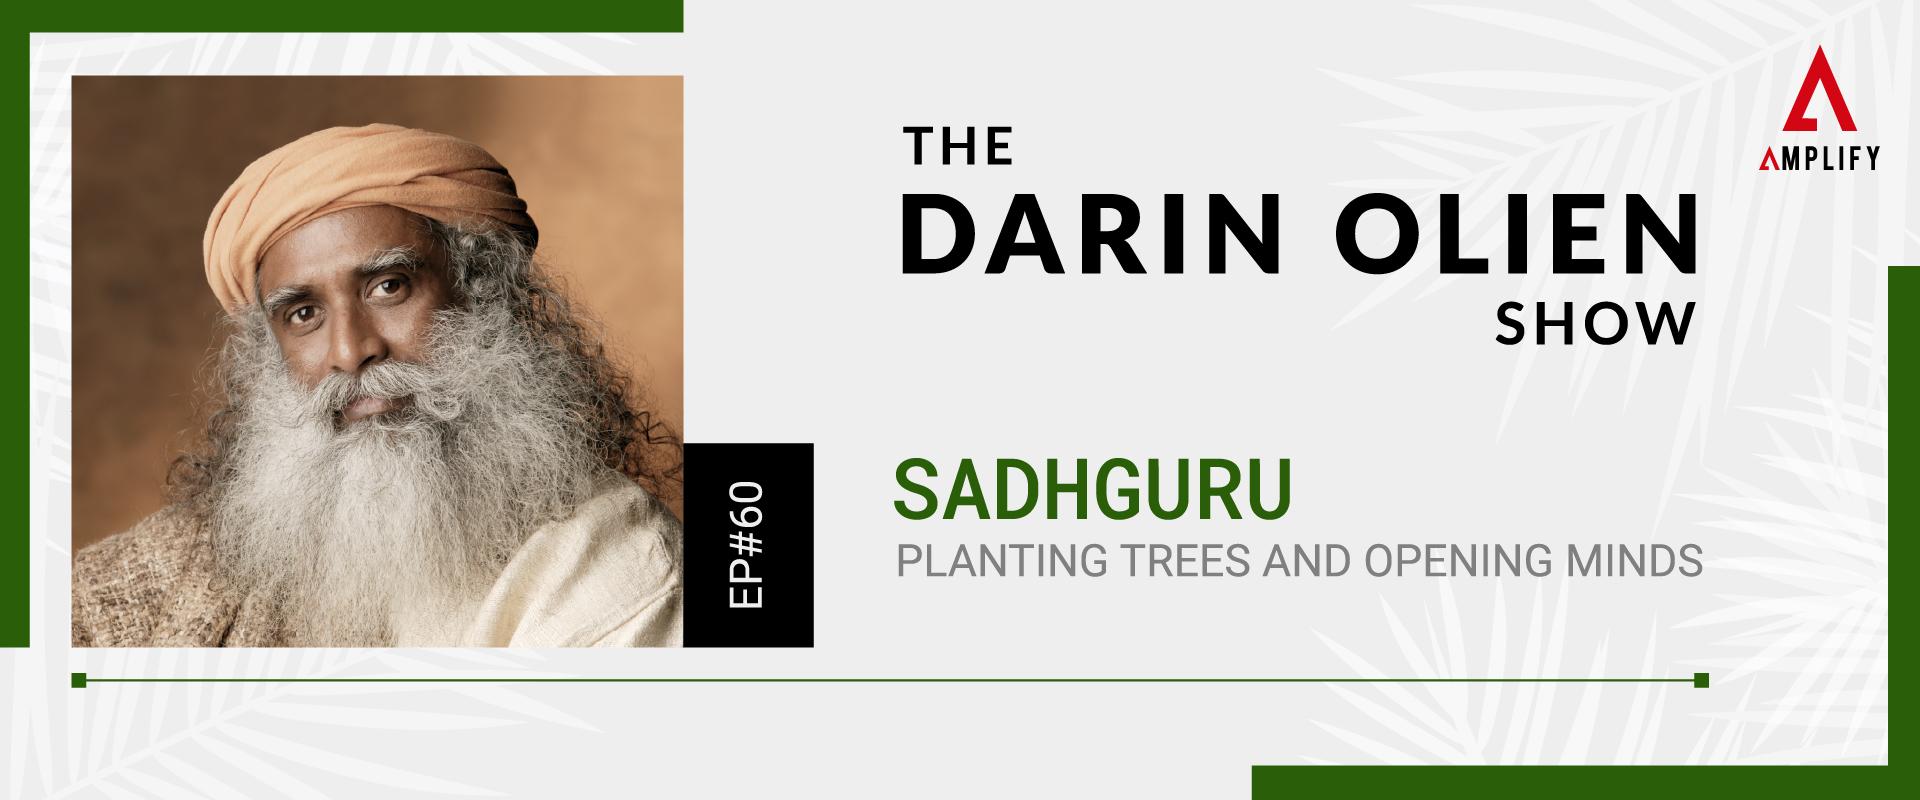 #60 Sadhguru on Planting Trees and Opening Minds